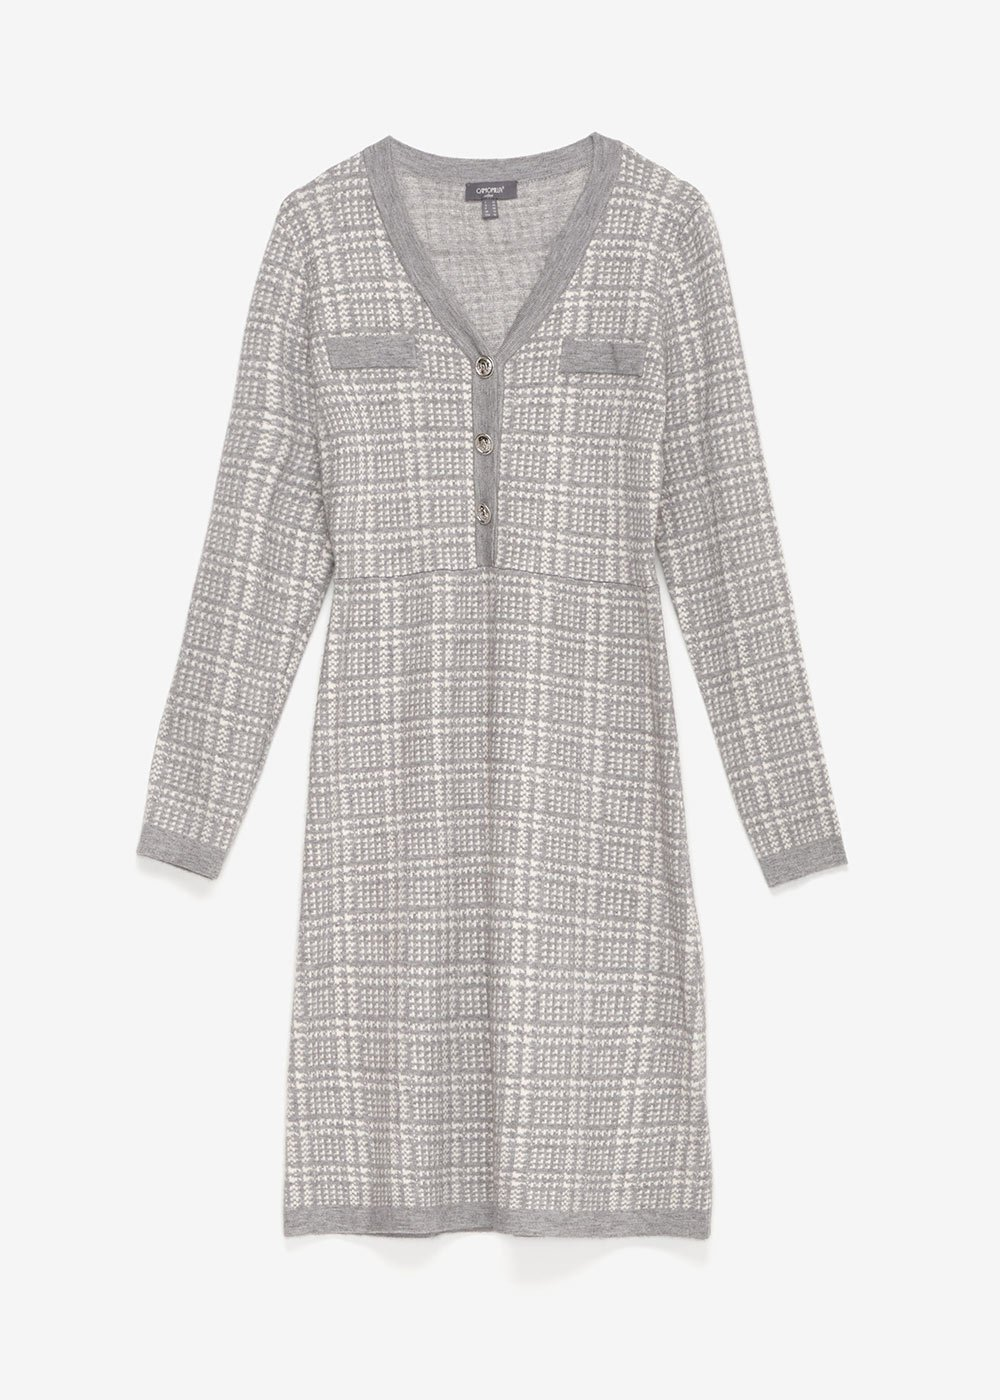 Adriano dress with check pattern - Medium Gre / Latte / Fantasia - Woman